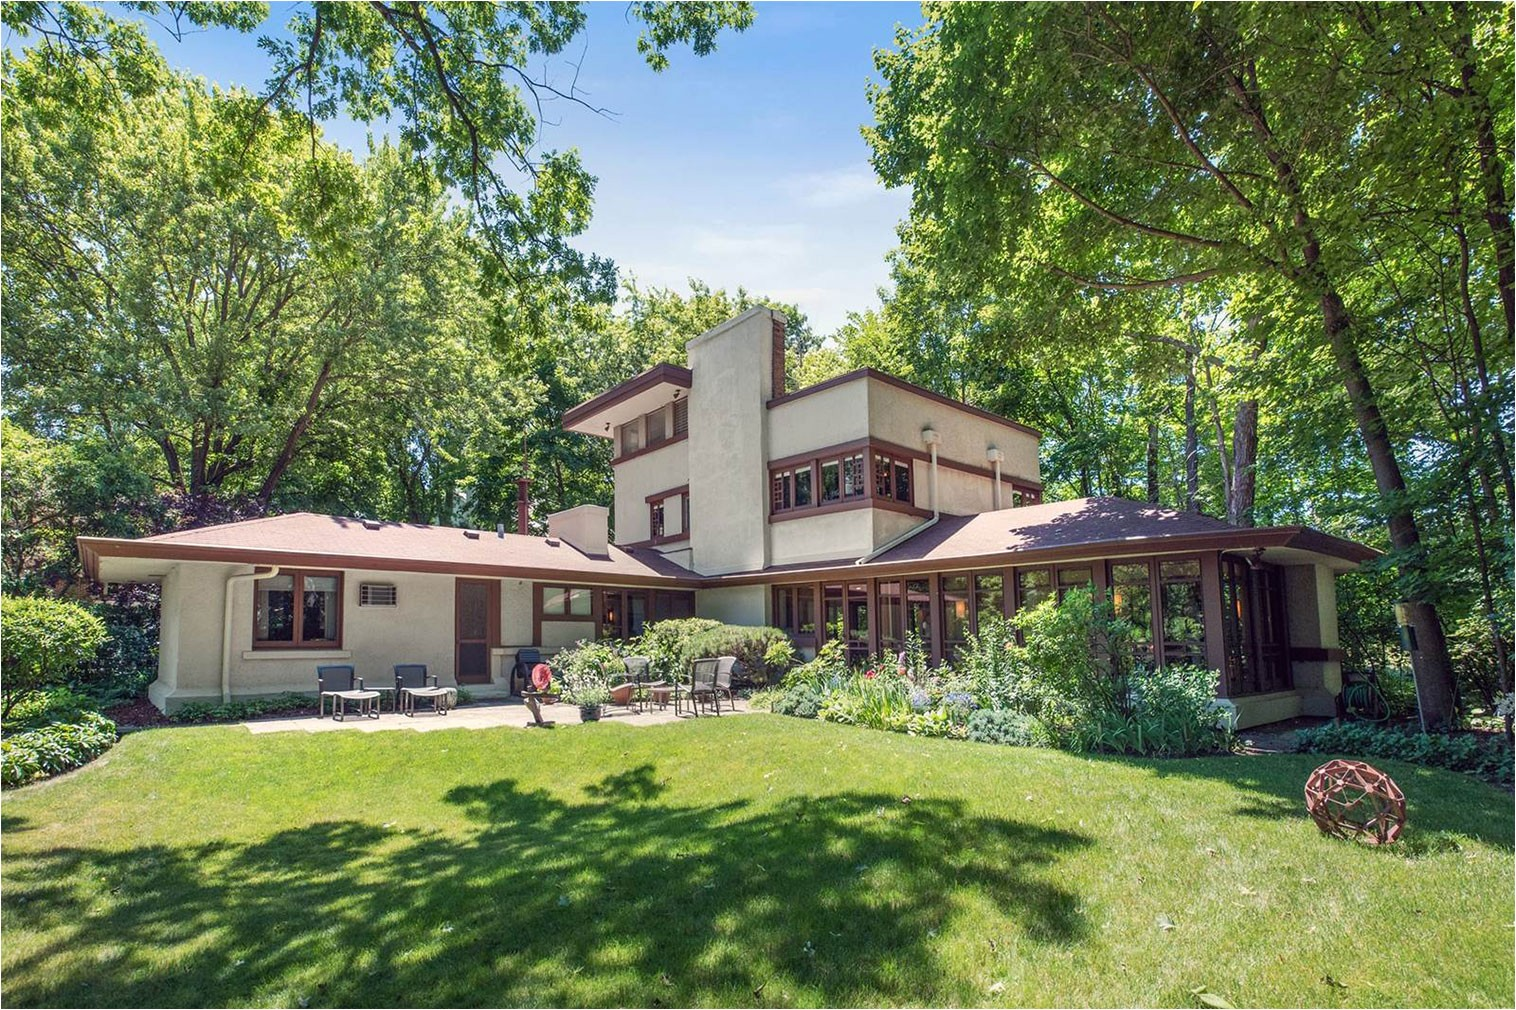 frank lloyd wright houses for sale